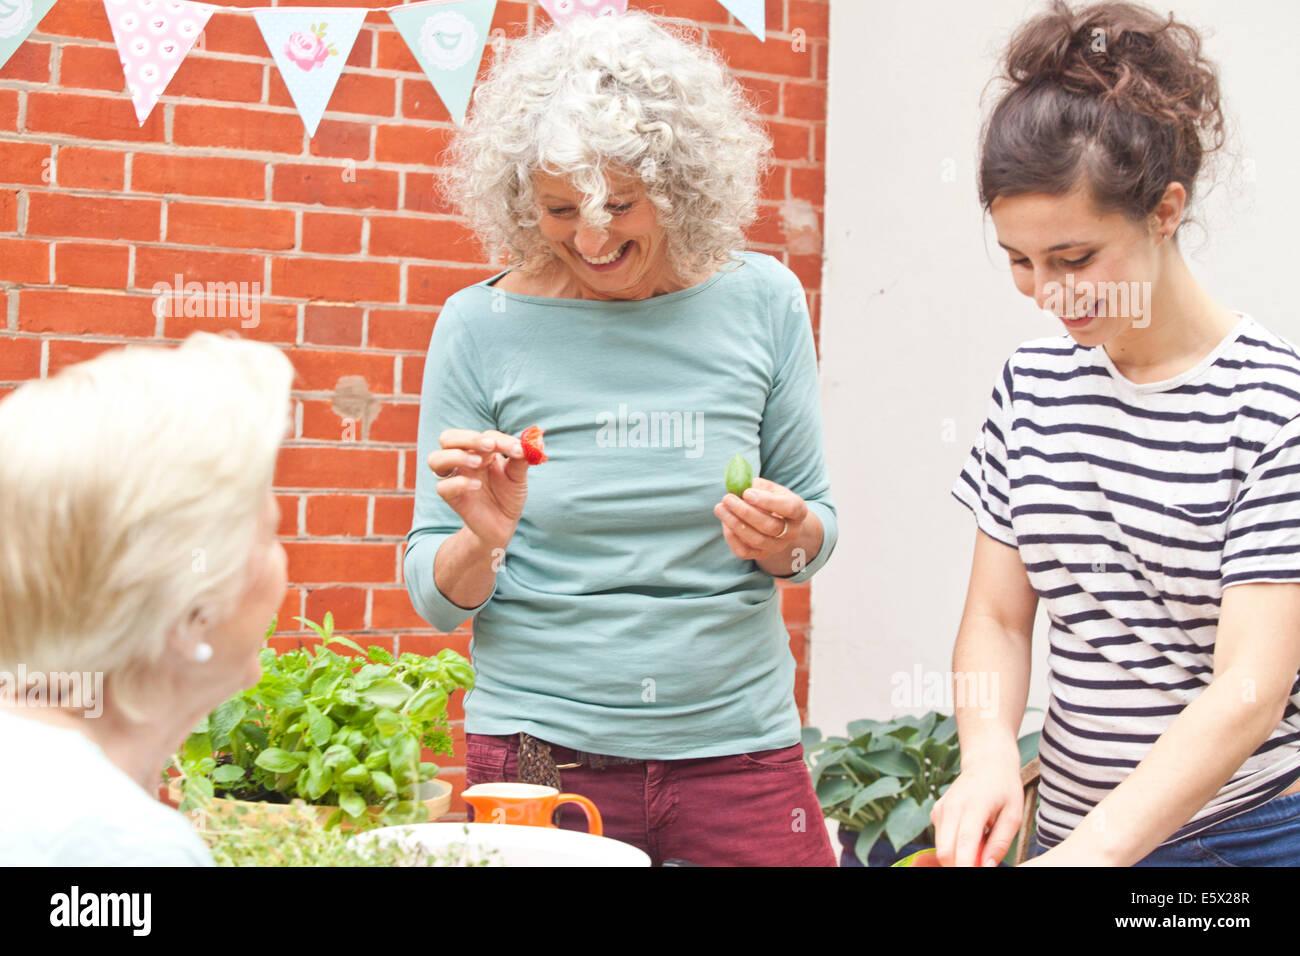 Three women preparing fresh food at garden table - Stock Image